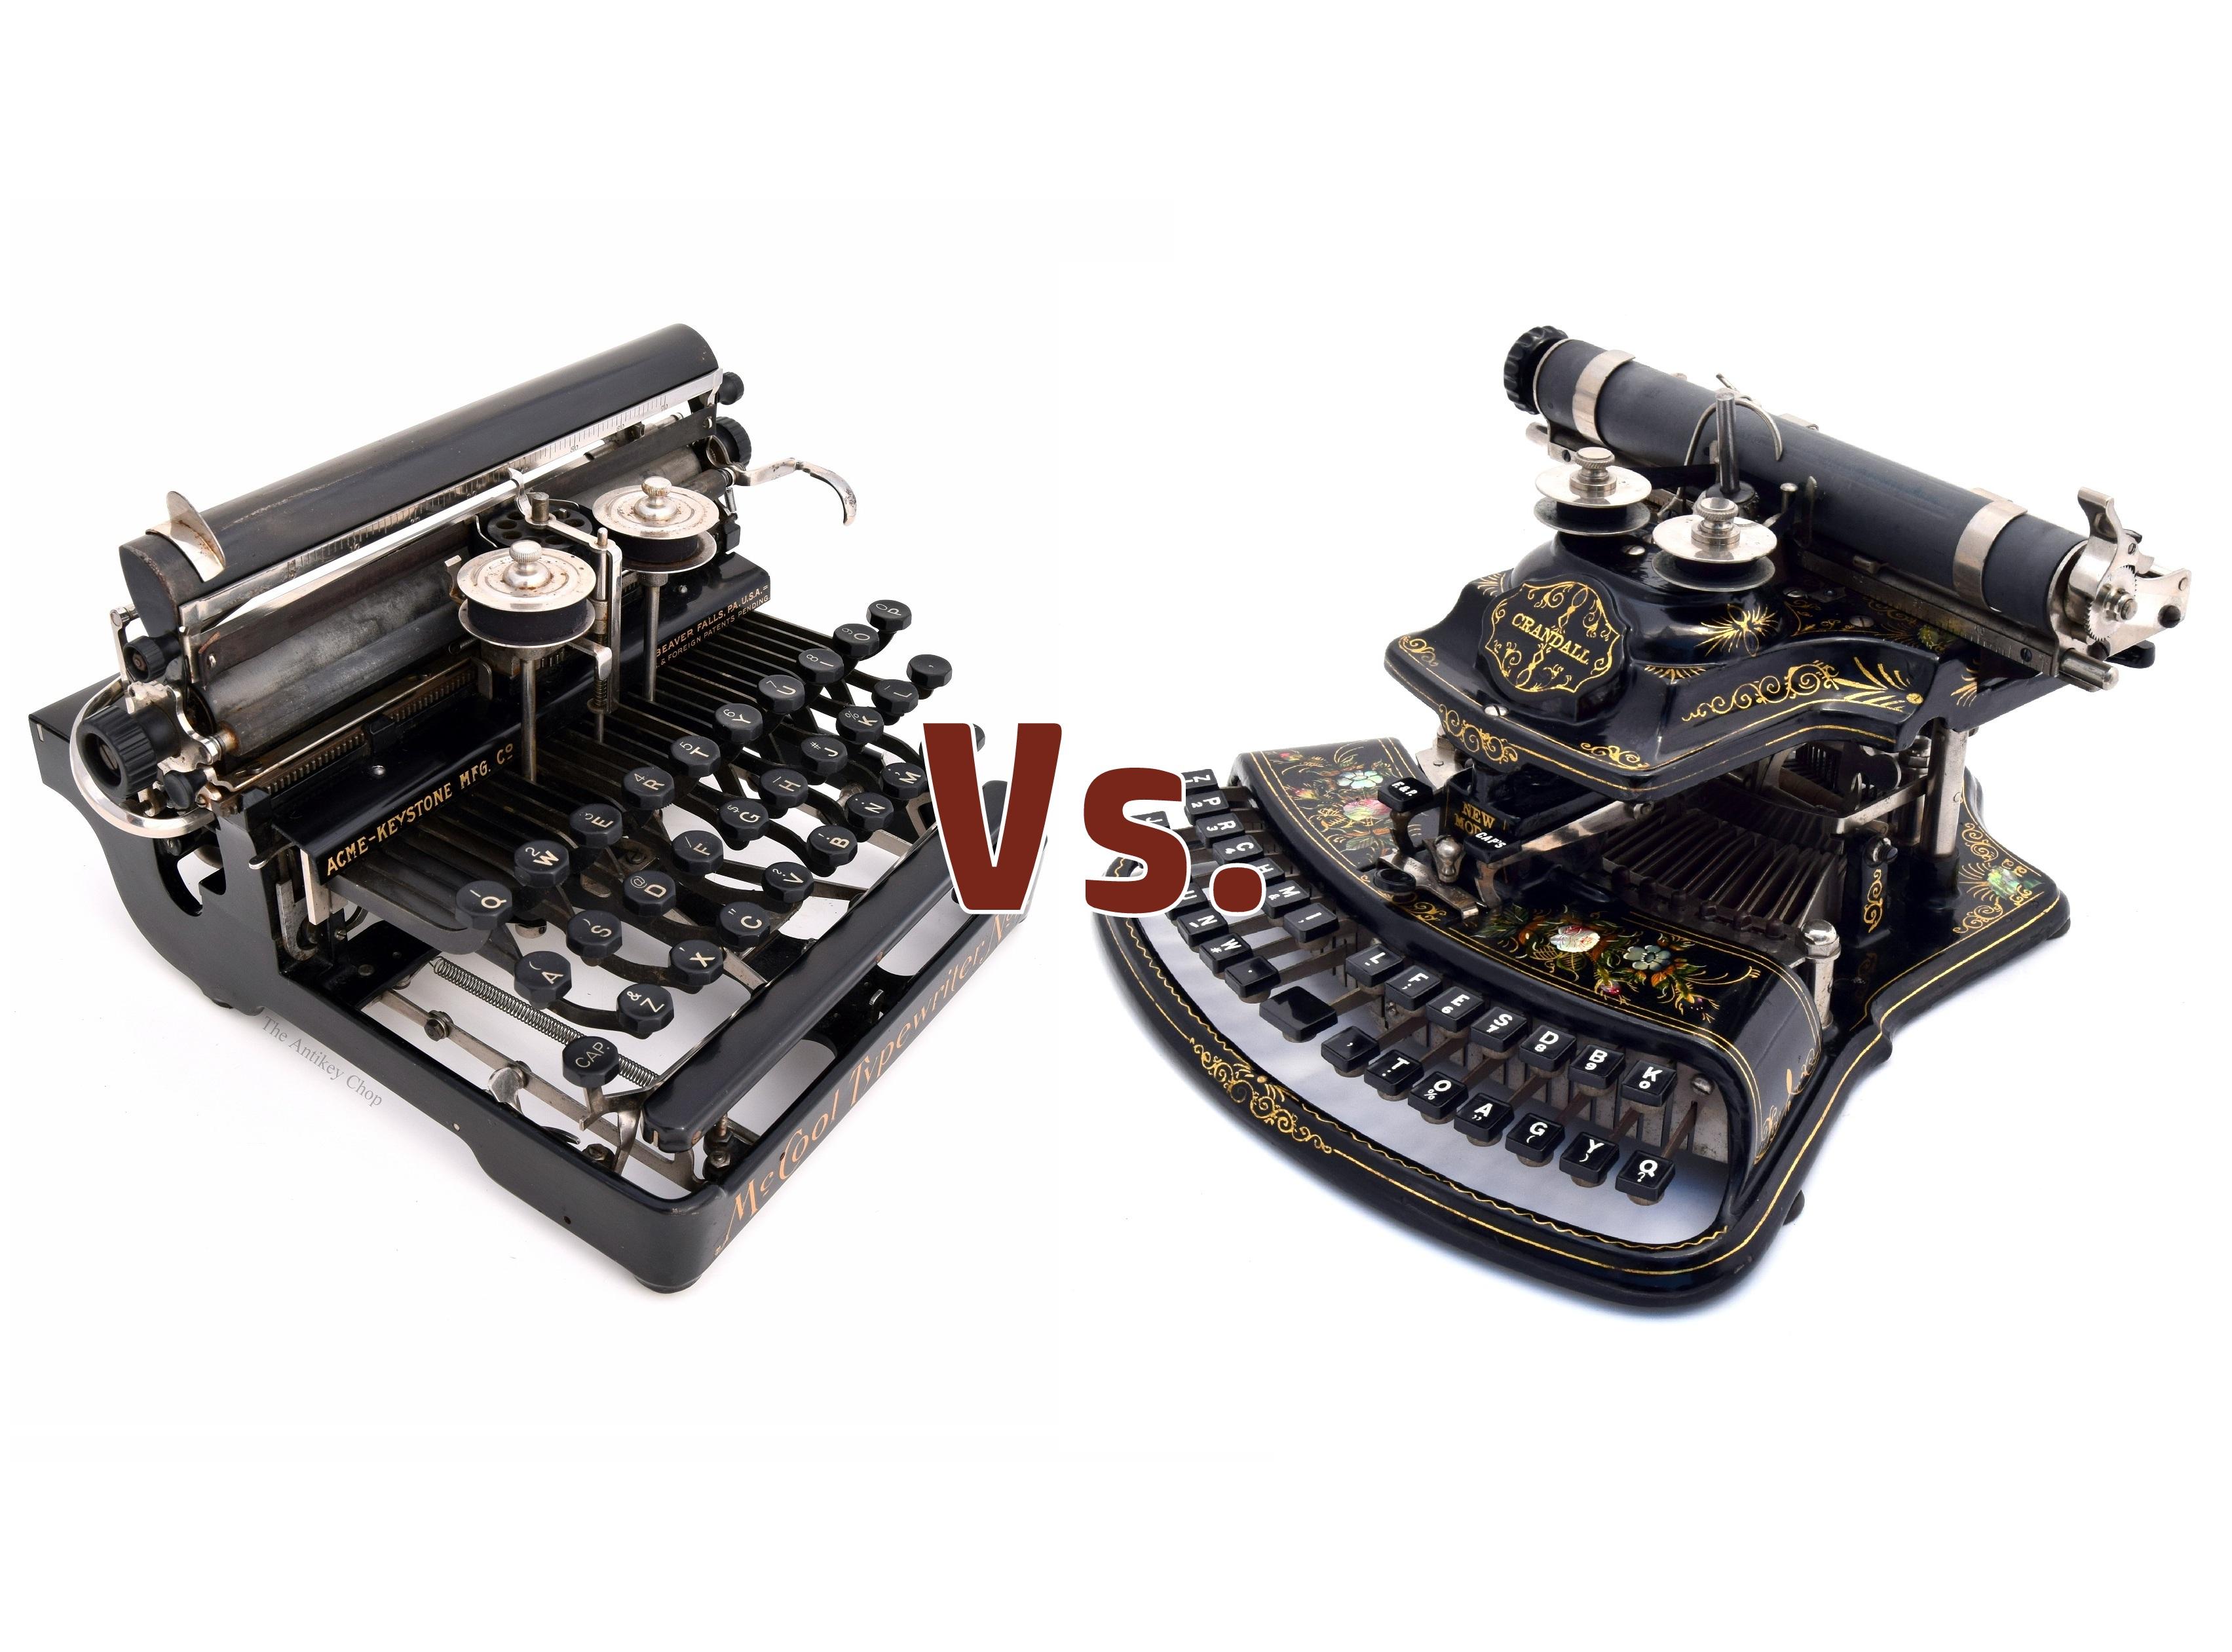 Rarity vs Desirability